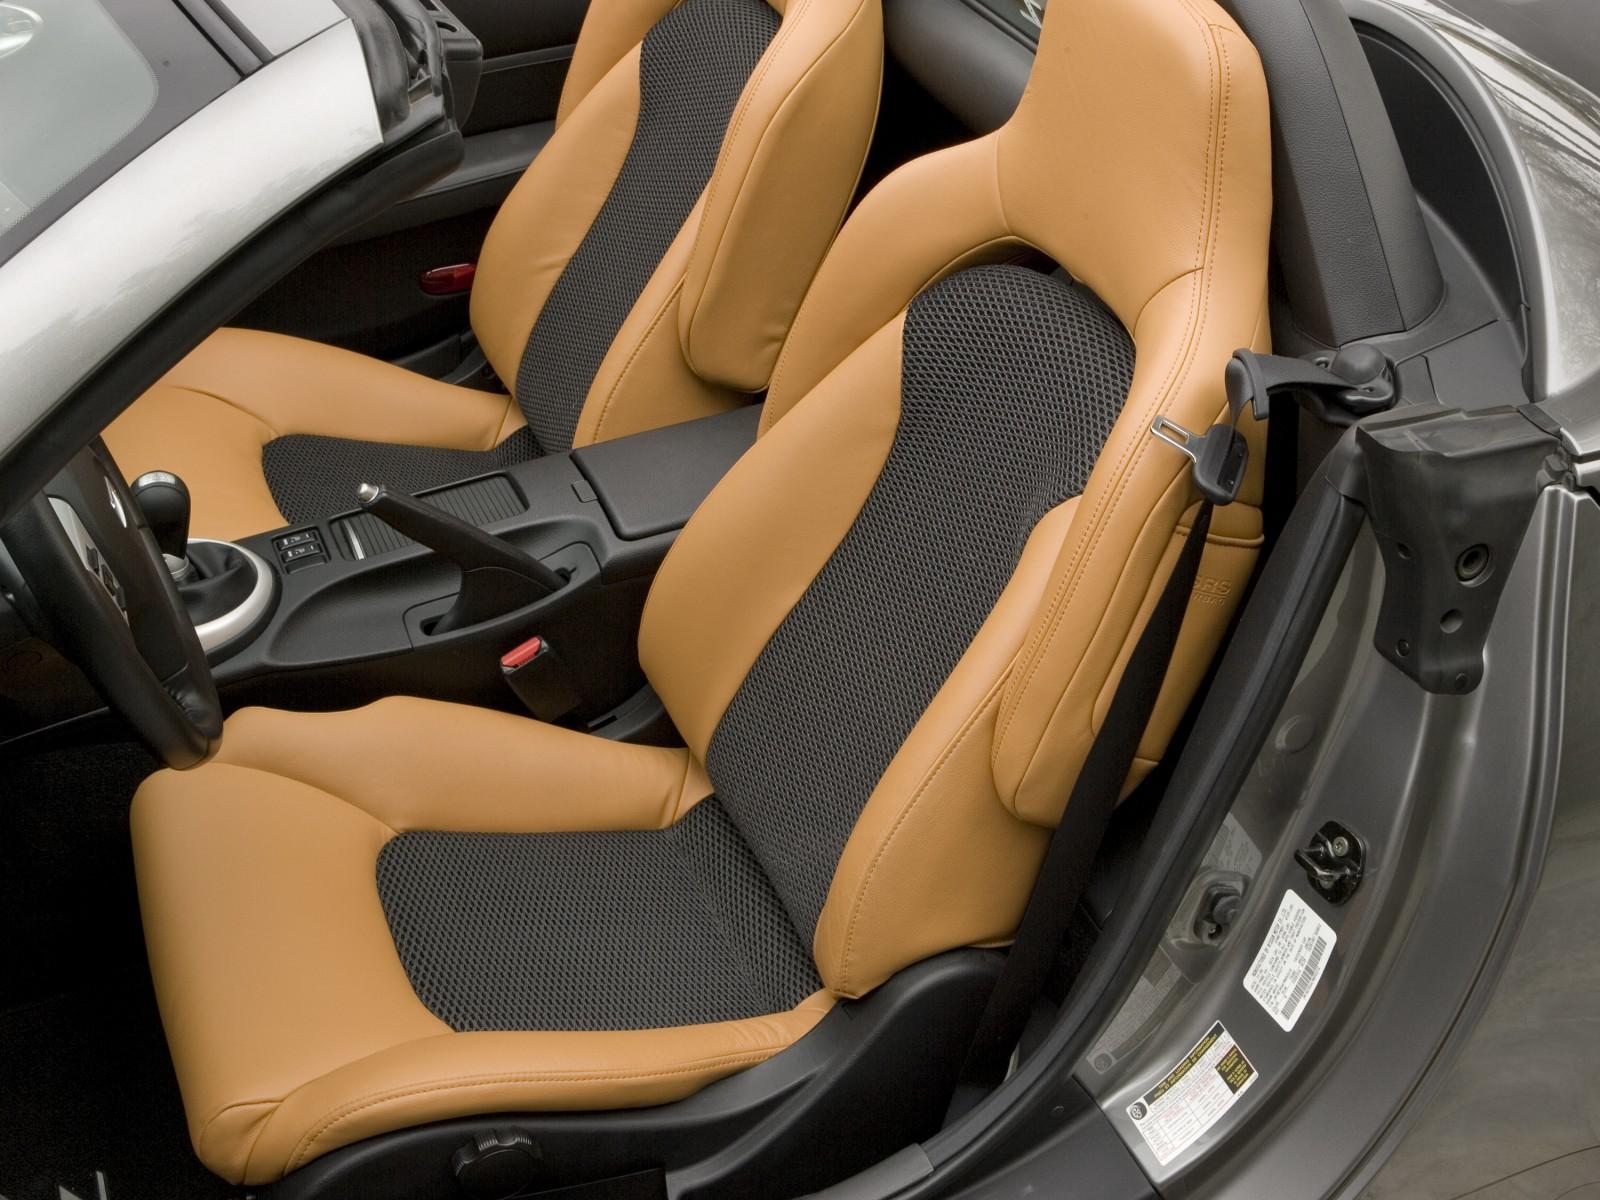 2008-Nissan-350Z-Roadster-08-1600x1200.j